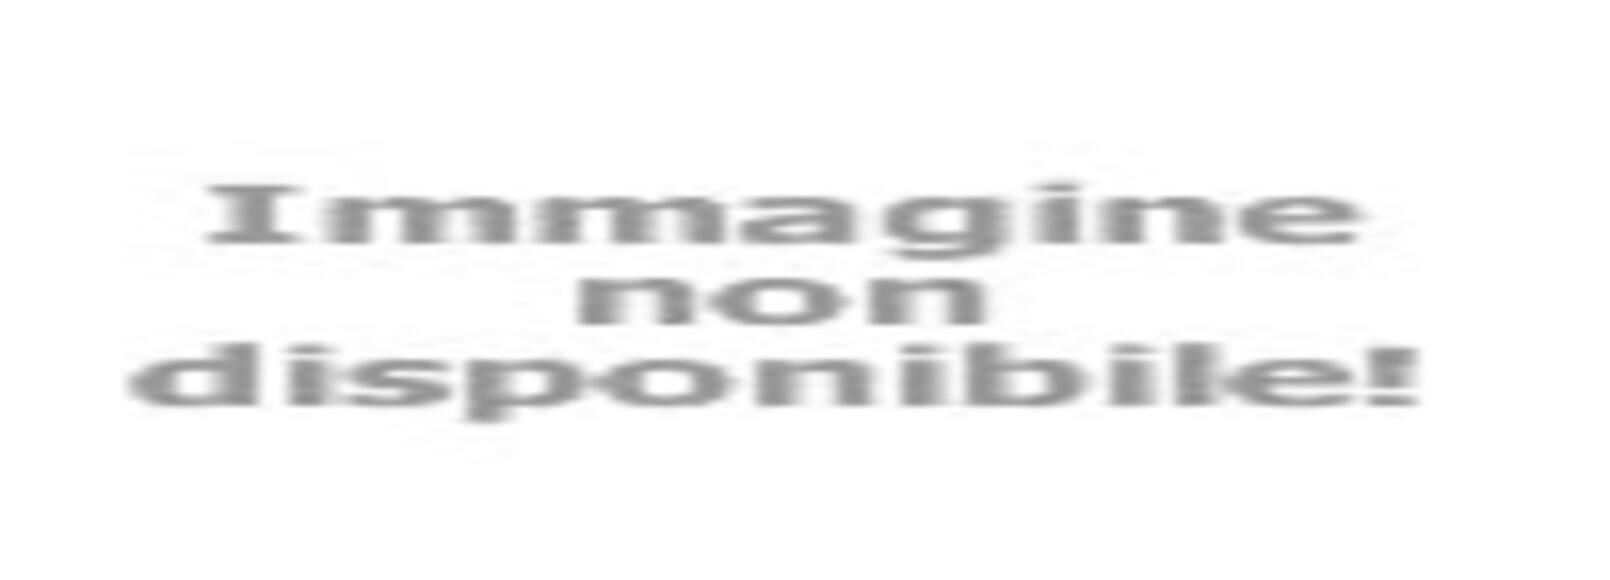 jhotel it sala-meeting-online-torino-con-sitema-ad-alta-tecnologia 012